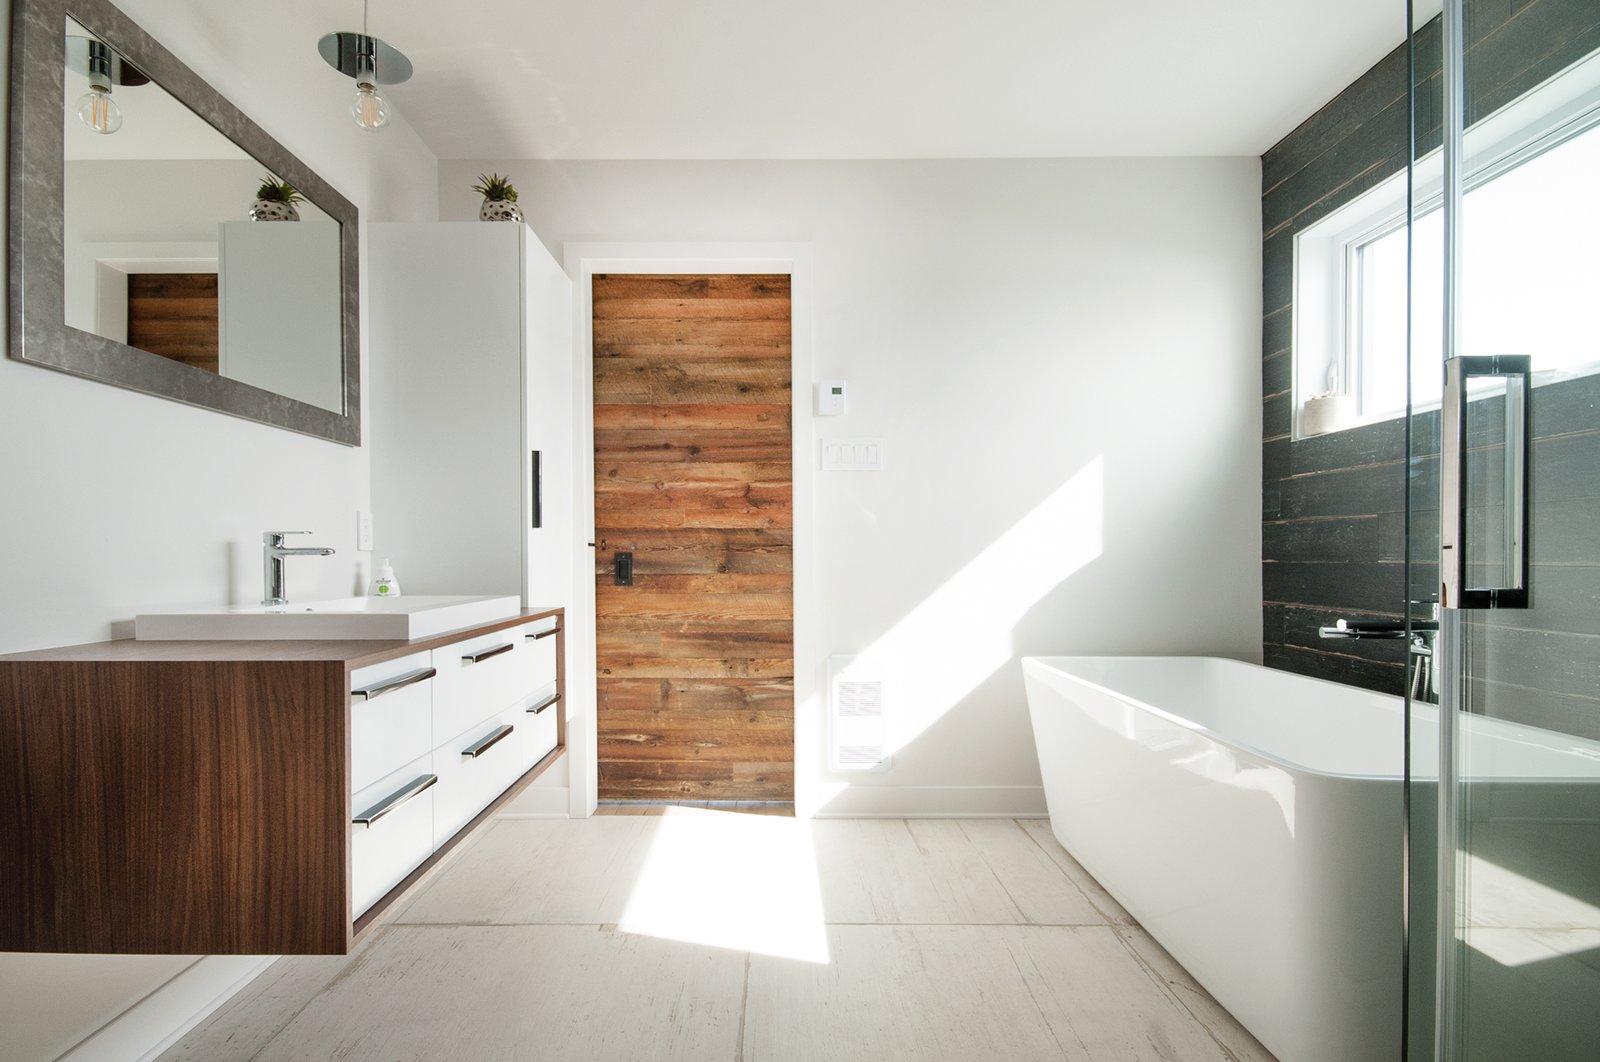 Main bathroom with RIOBEL faucets, custom made sliding door and RAMACIERI SOLIGO tiles  Concept DUB House by Concept Dub